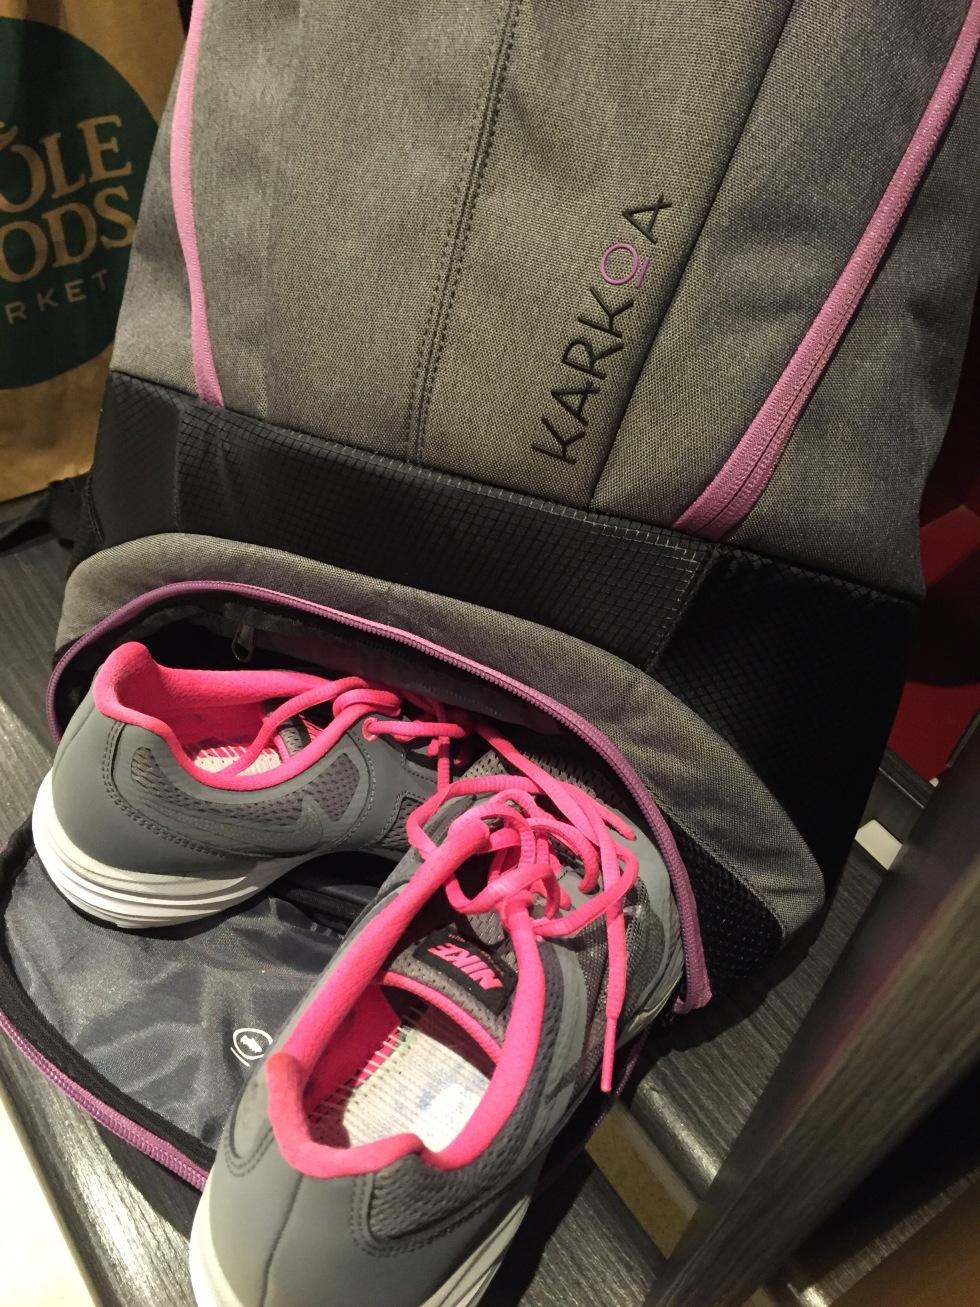 sports bag KARKOA trainers .jpg